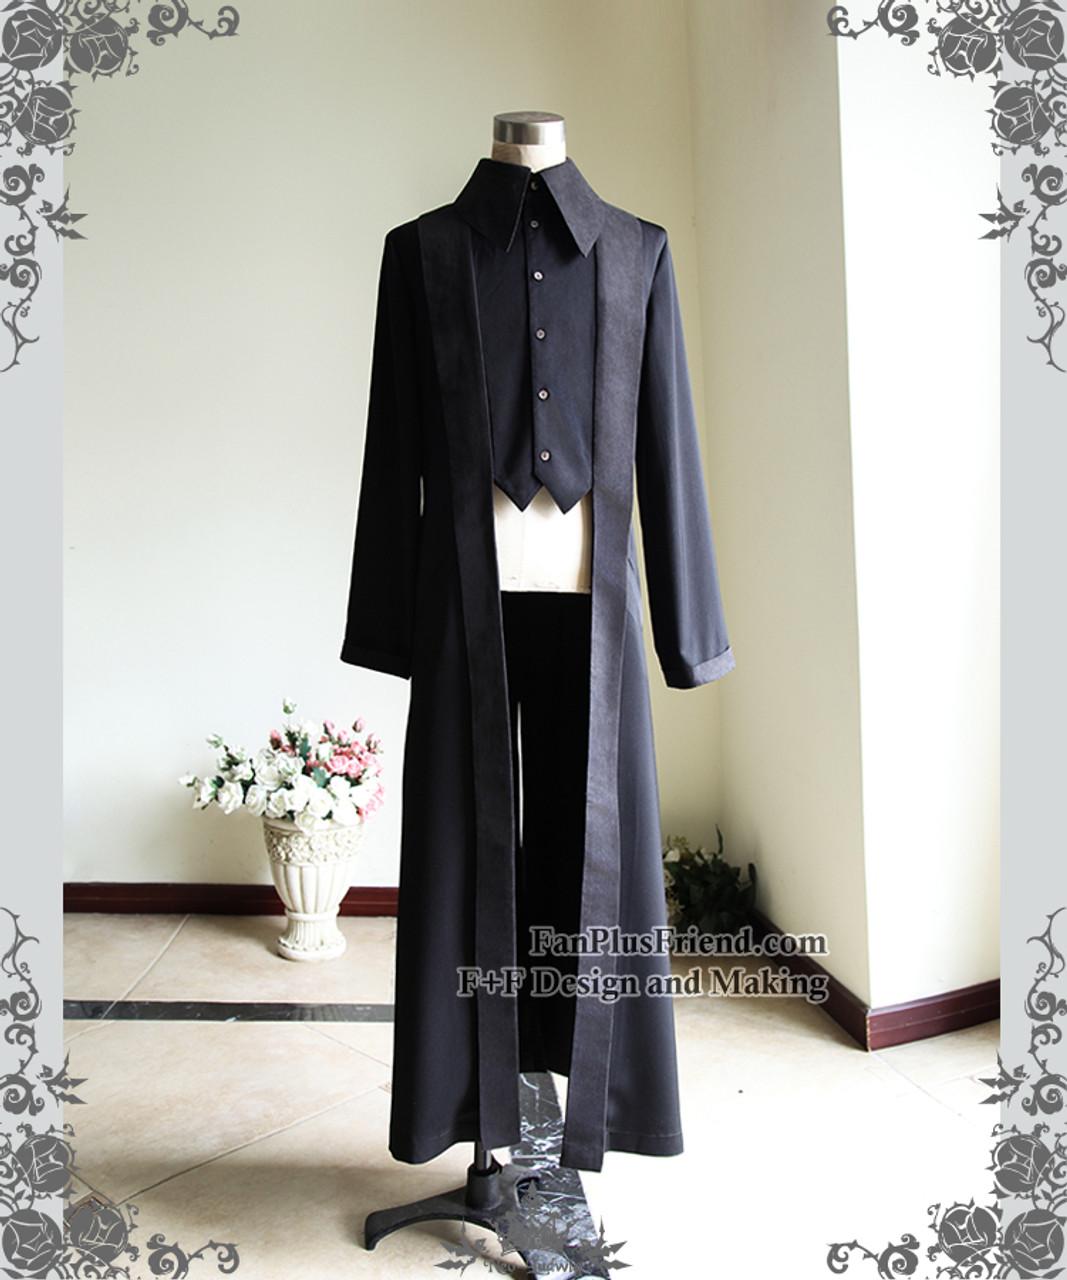 15e8a9fc66 Vintage Dress Shirt Long Cocktail Shirt Pirate Punk Fashion Black Shirt  Jacket